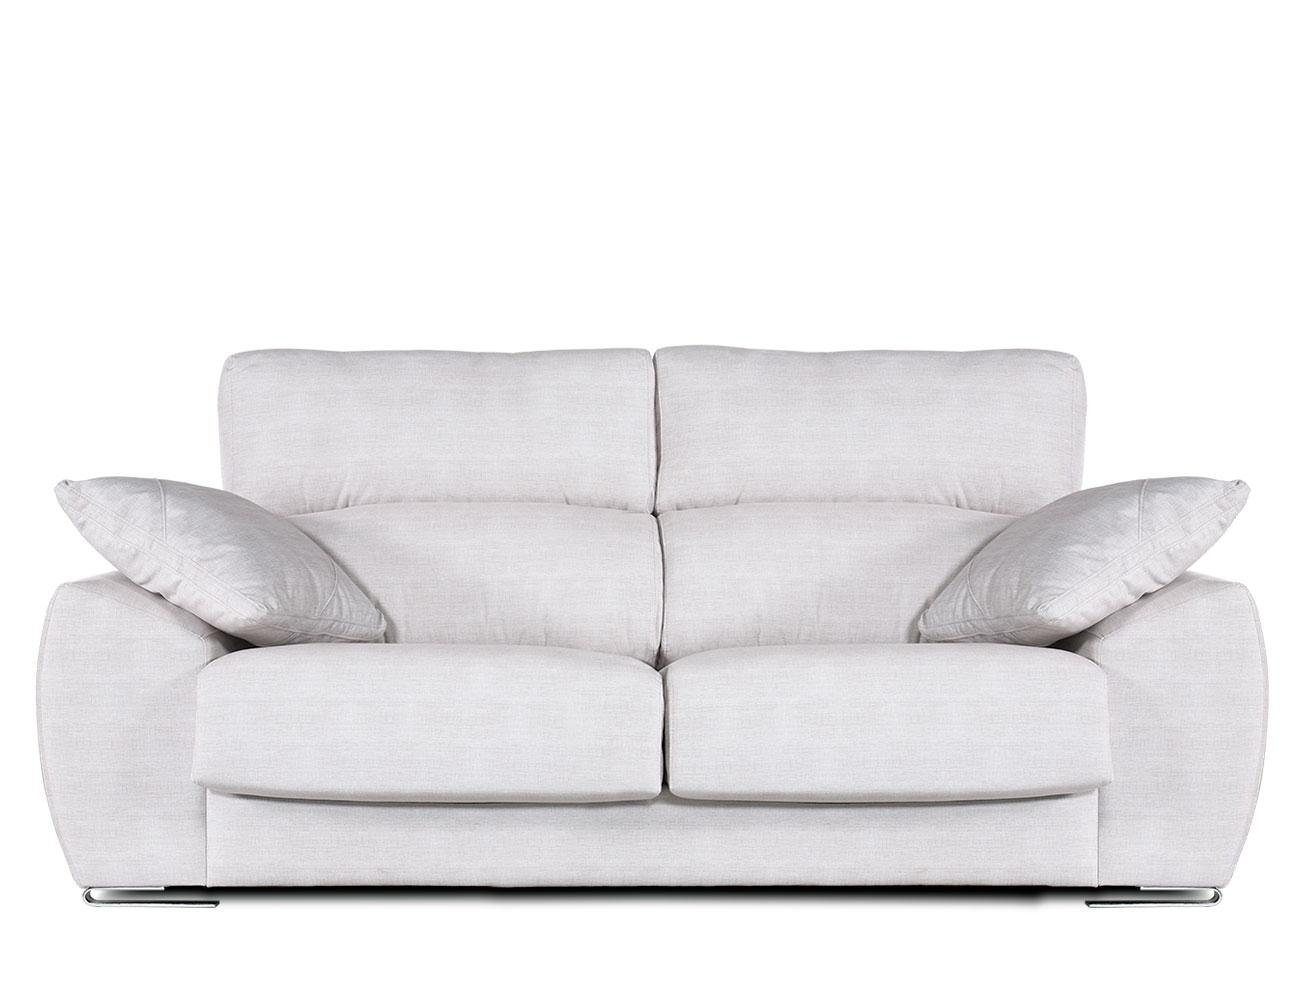 Sofa moderno 3plazas7